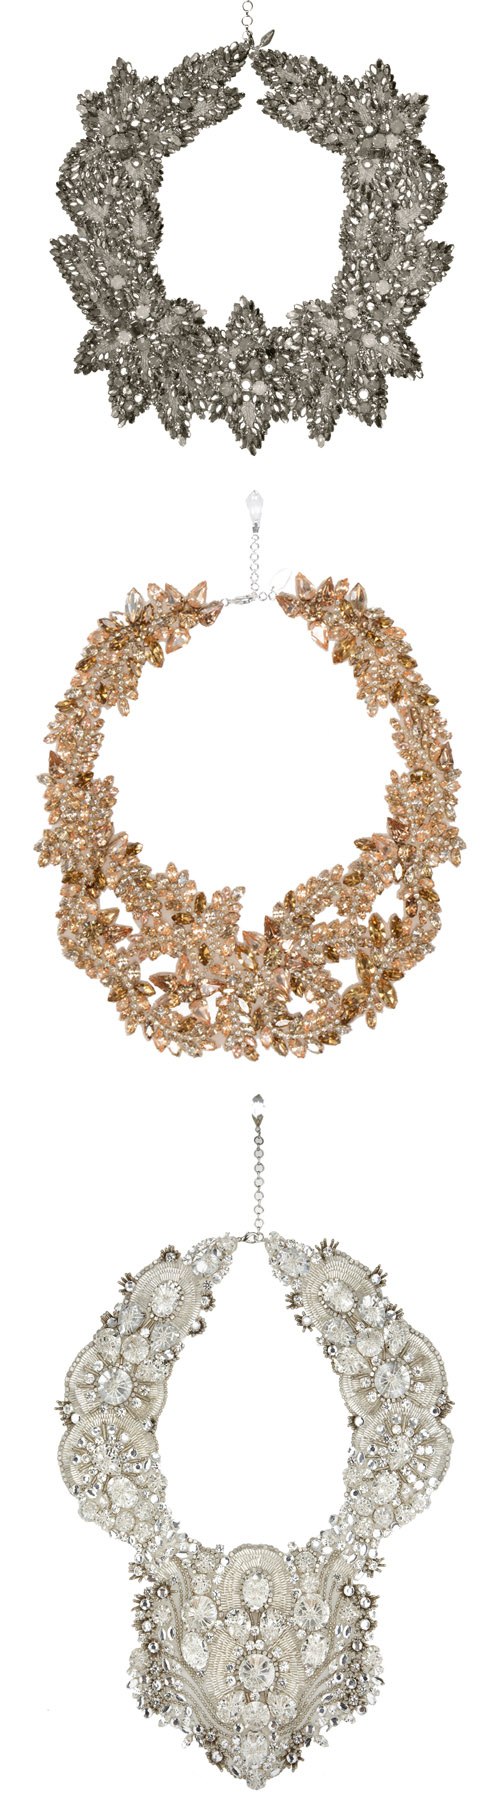 wedding necklaces by Jenny Packham - spring 2014 bridal collection | via junebugweddings.com